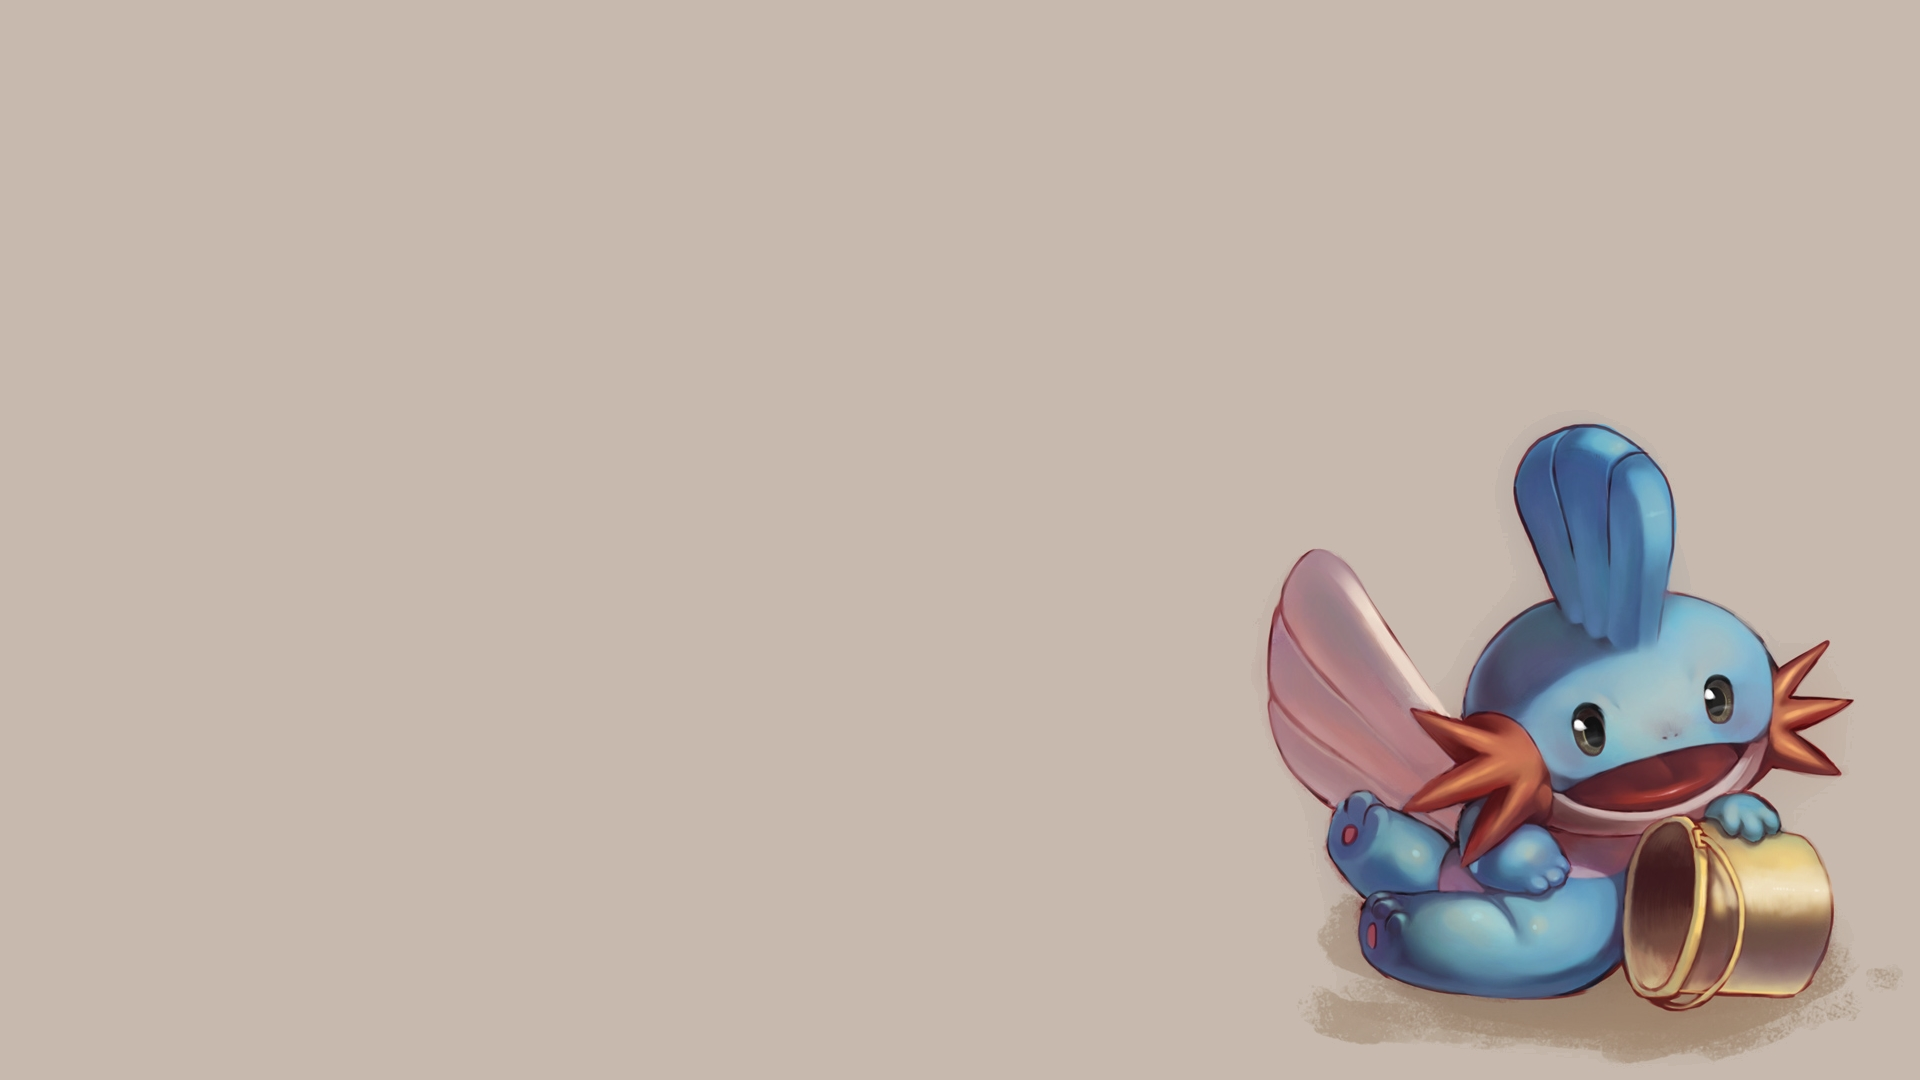 pokemon, Mudkip Wallpaper